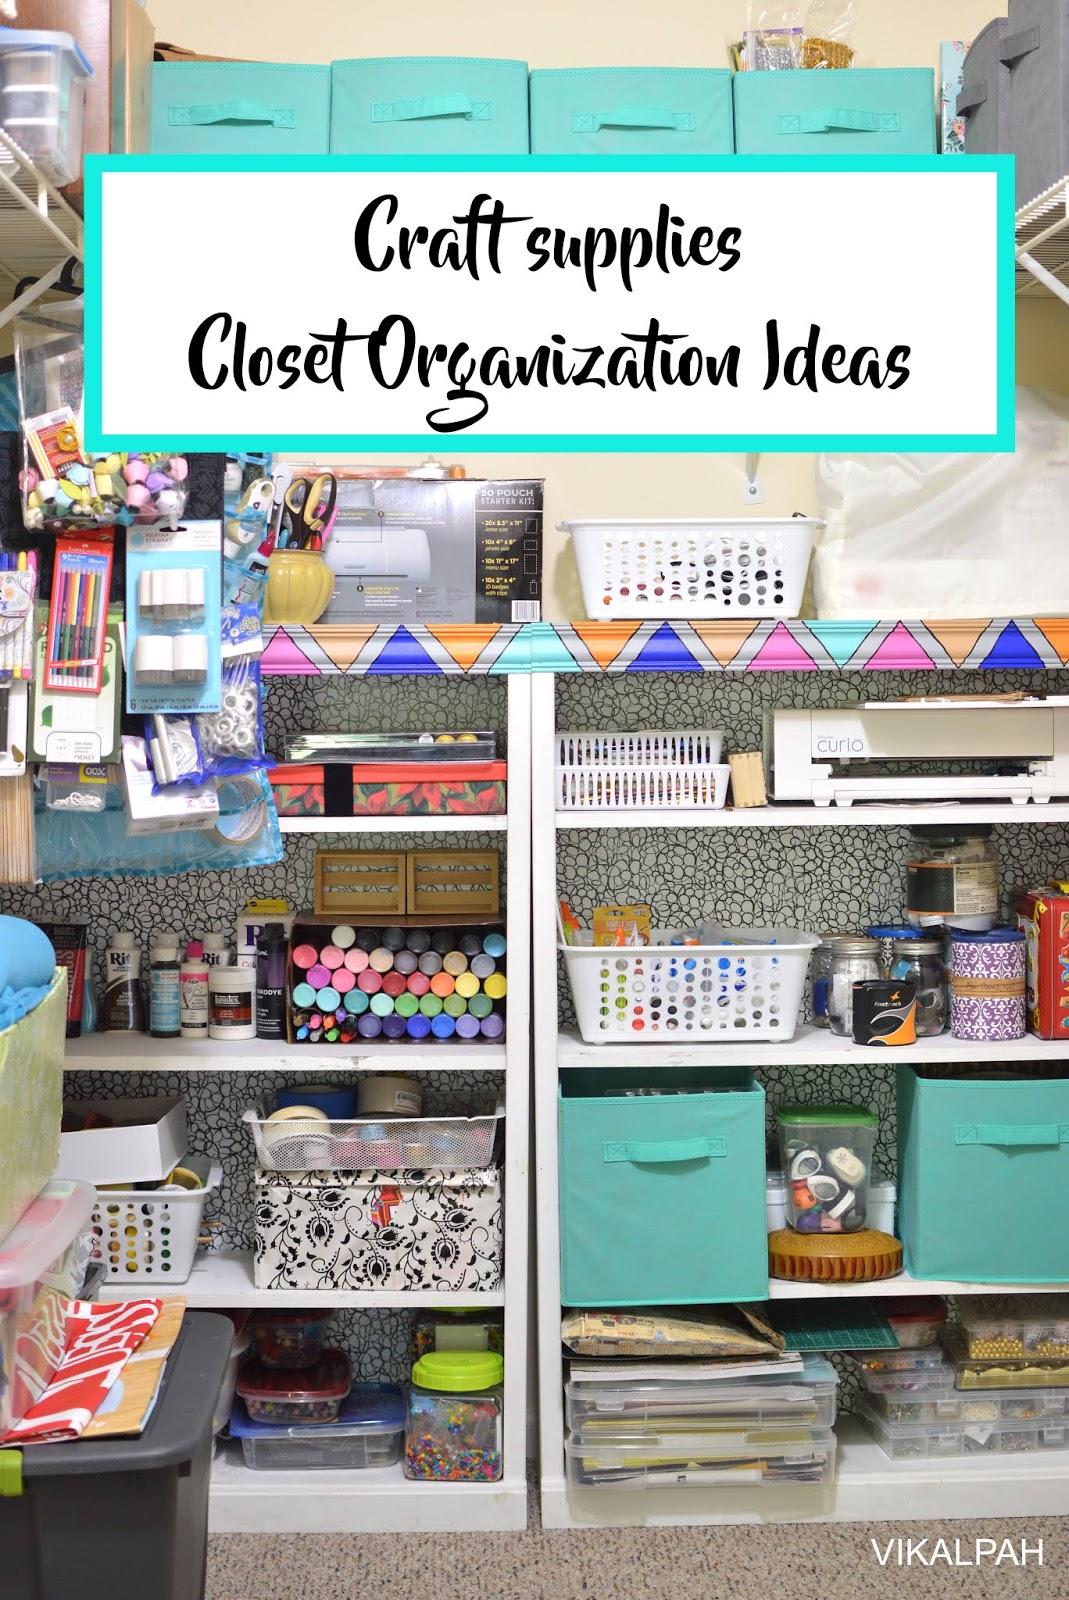 Vikalpah How I Organized My Craft Supplies In A Shared Closet Closet Organization Ideas